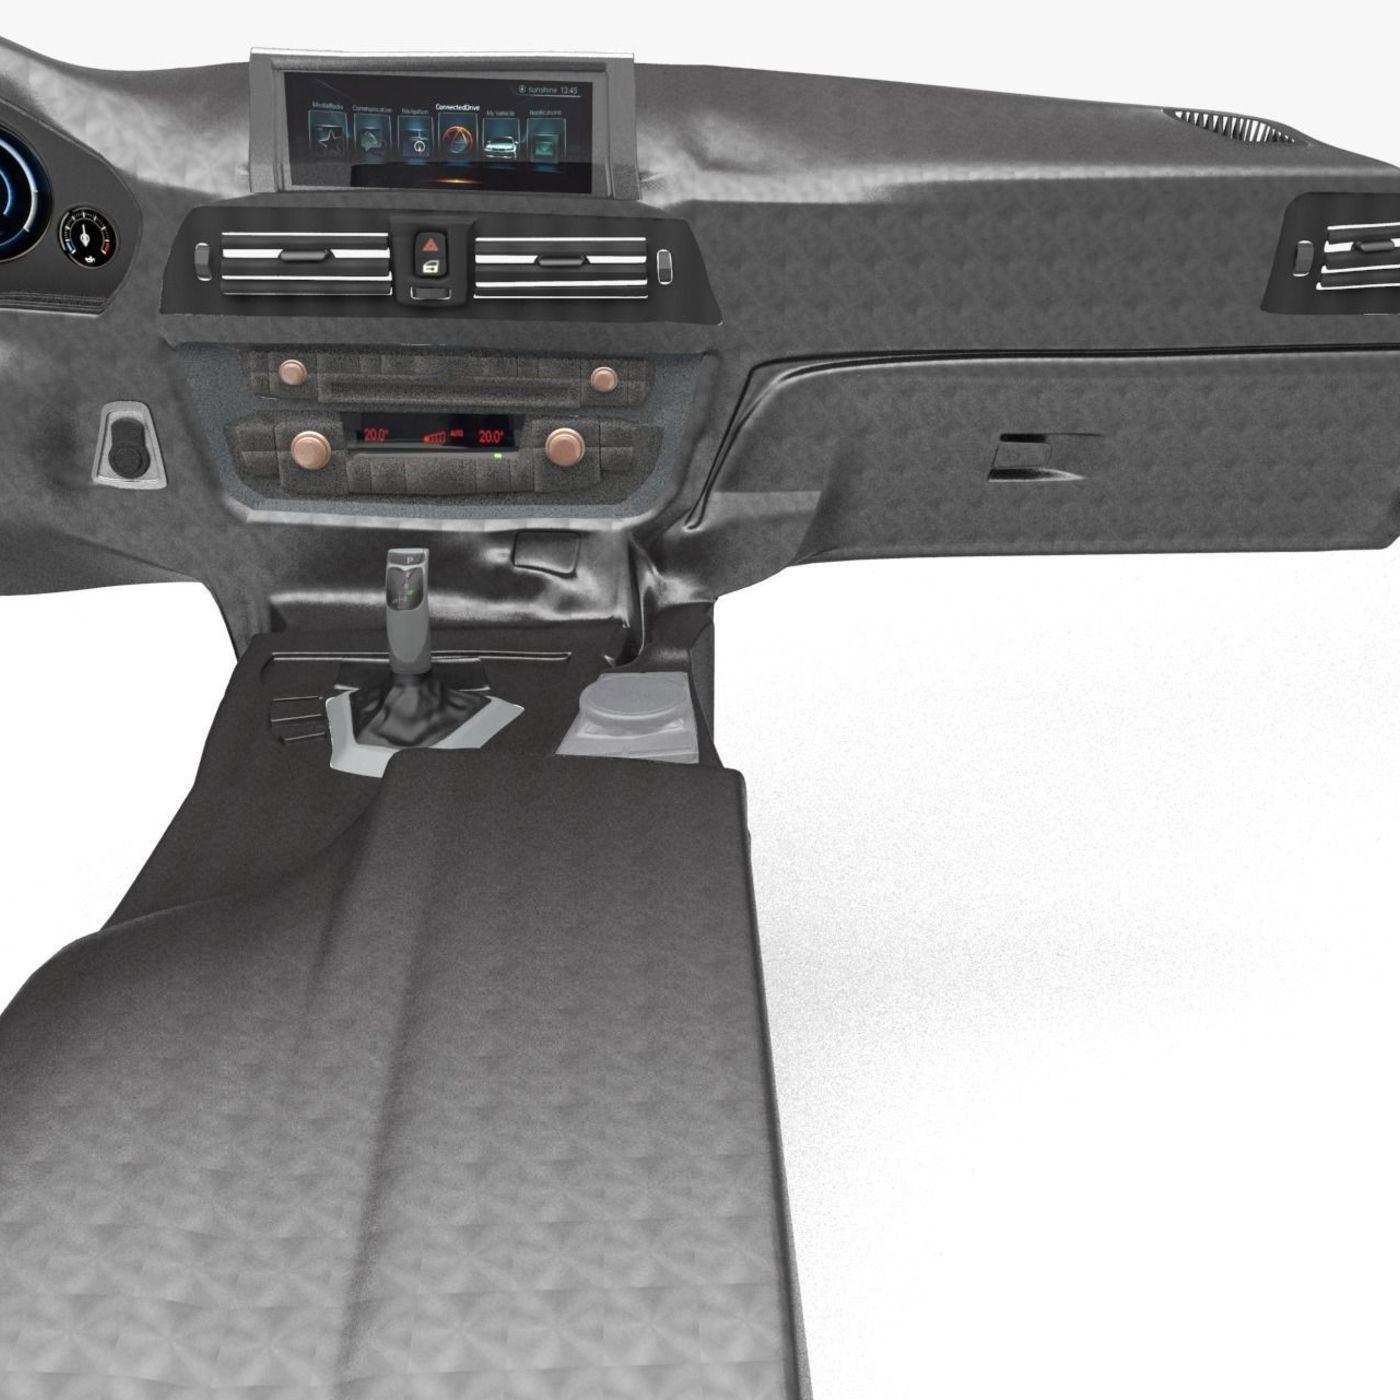 BMW 3 Series M Sport Dashboard-Armrest Basic Model